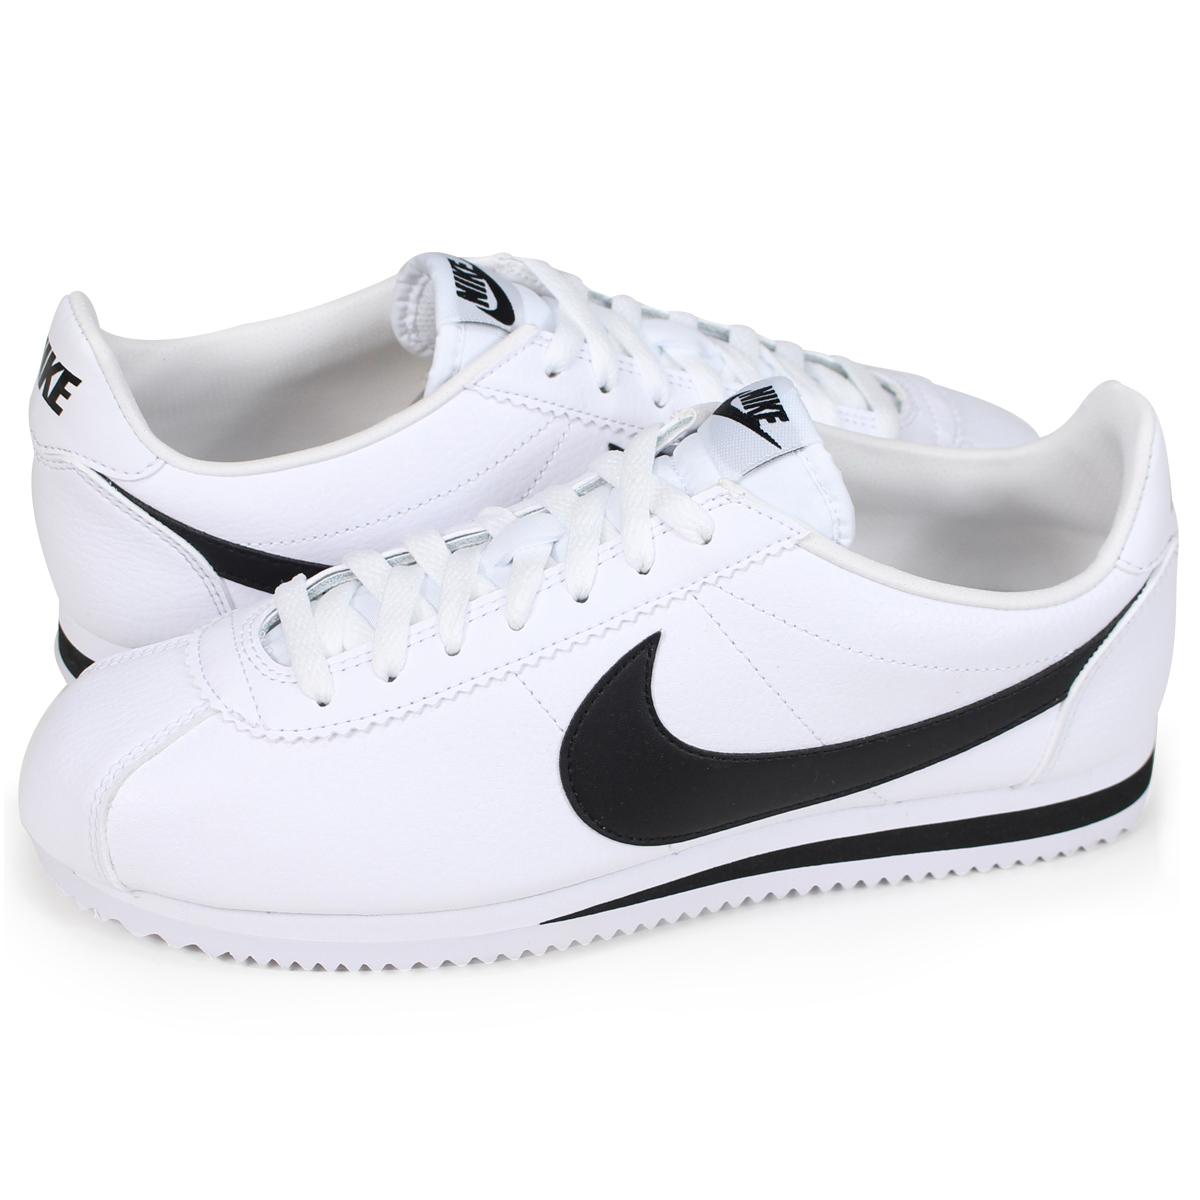 online retailer 563b7 d1fe1 ナイキコルテッツ NIKE sneakers men CLASSIC CORTEZ LEATHER 749,571-100 shoes white   12 21 Shinnyu load